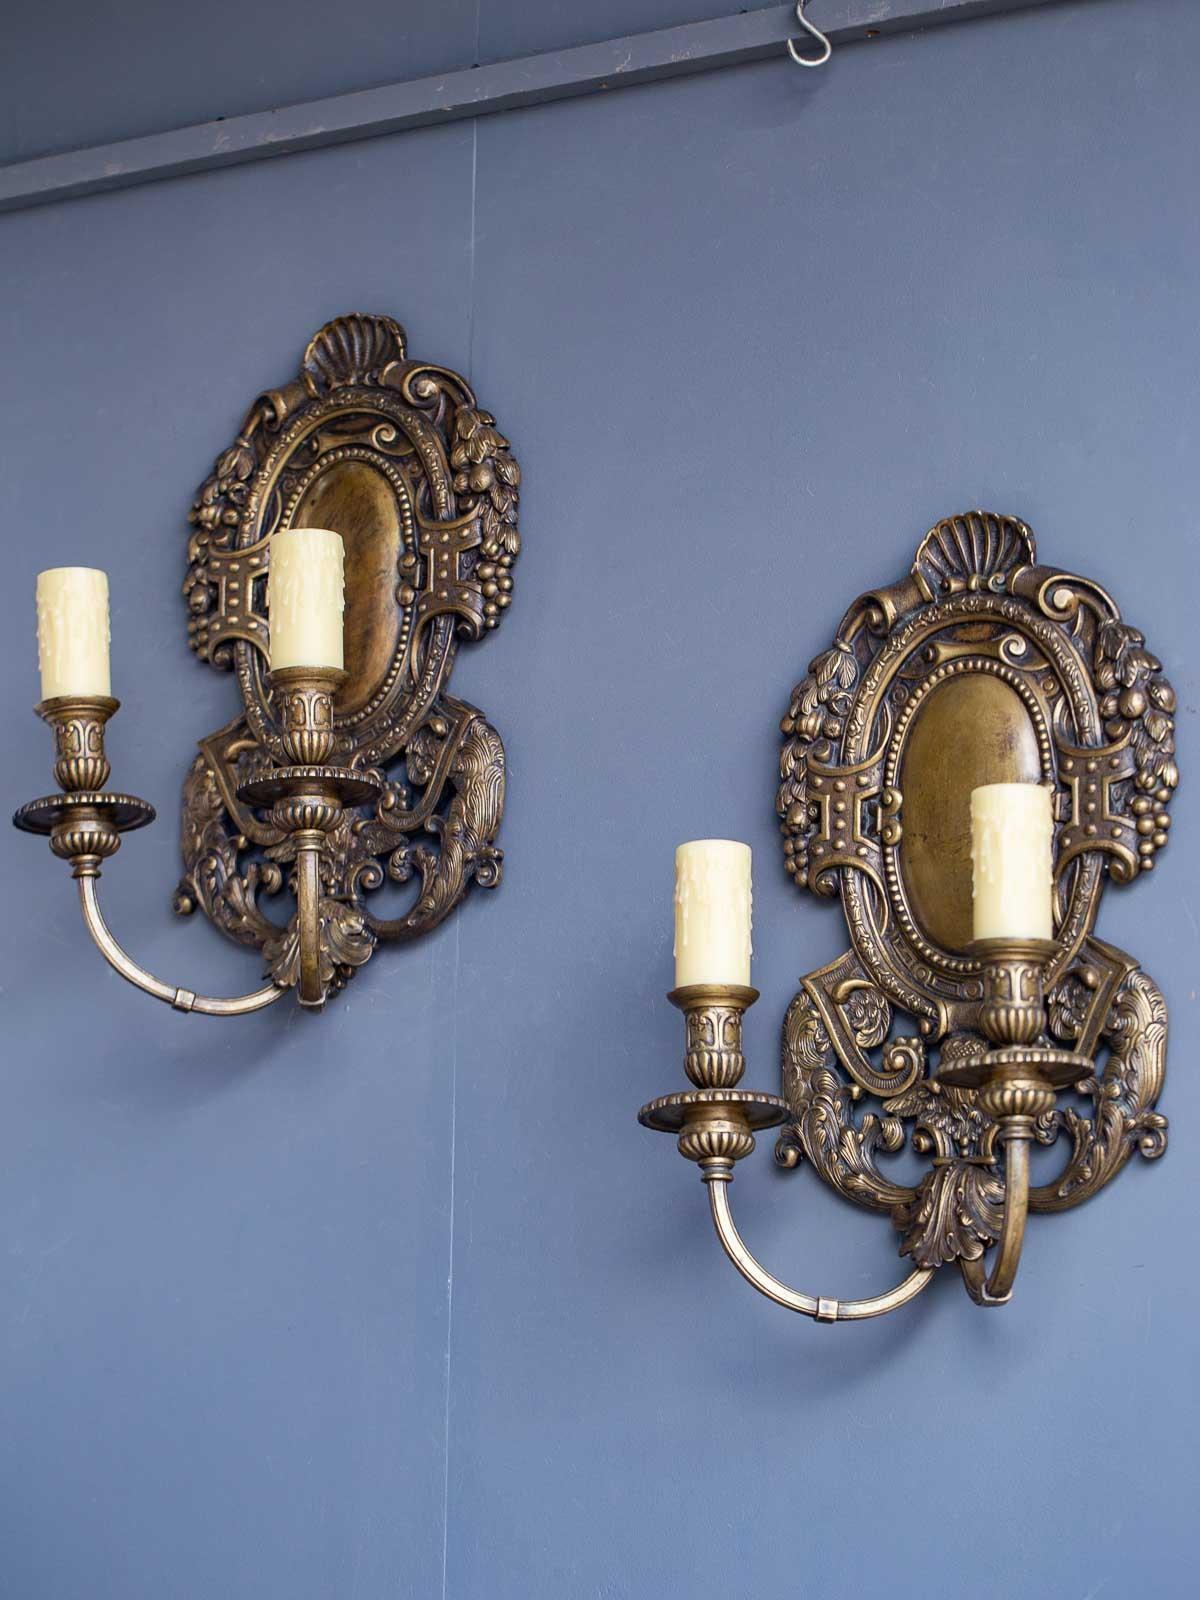 Decorative Arts Incredible Massive Pair Of Louis Xiv Style Dore Bronze Sconces With Lions 1880